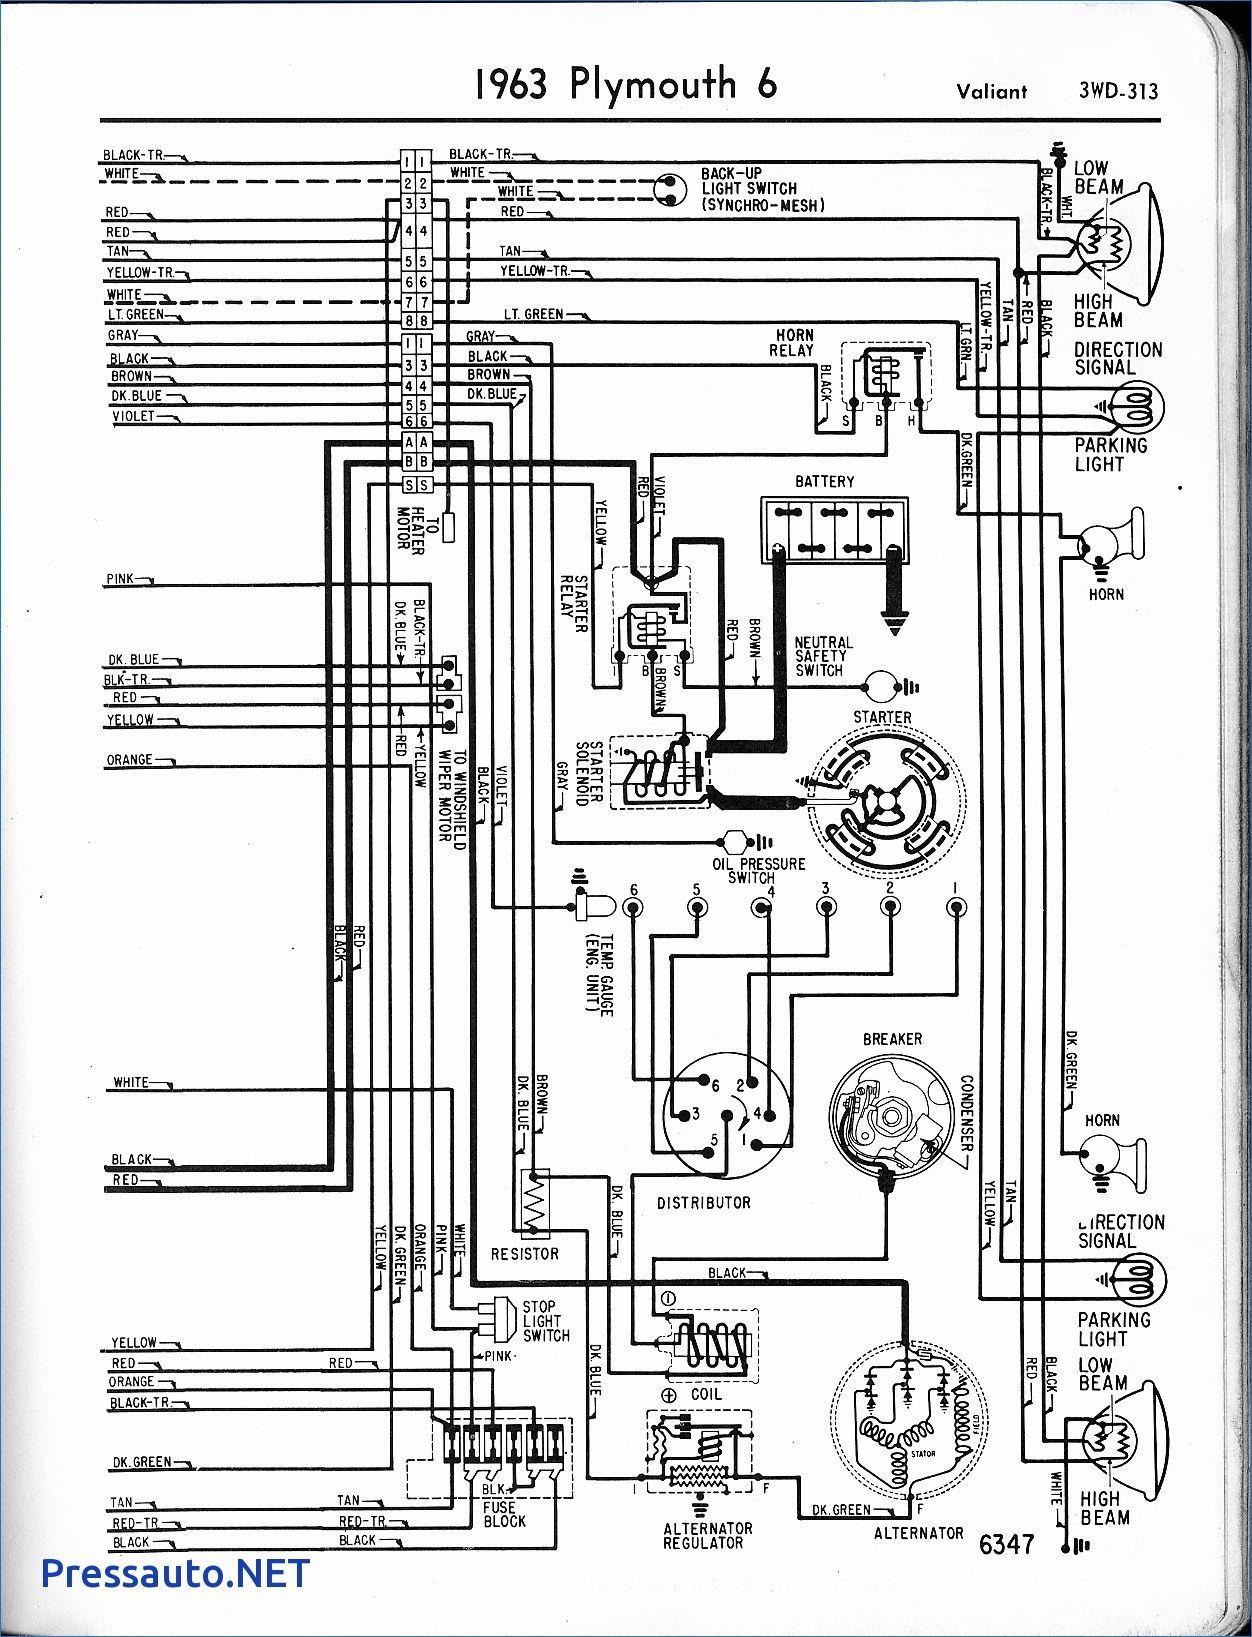 Limit Switch Wiring Schematic Limit Switch Wiring Diagram Motor Com - Honeywell Fan Limit Switch Wiring Diagram